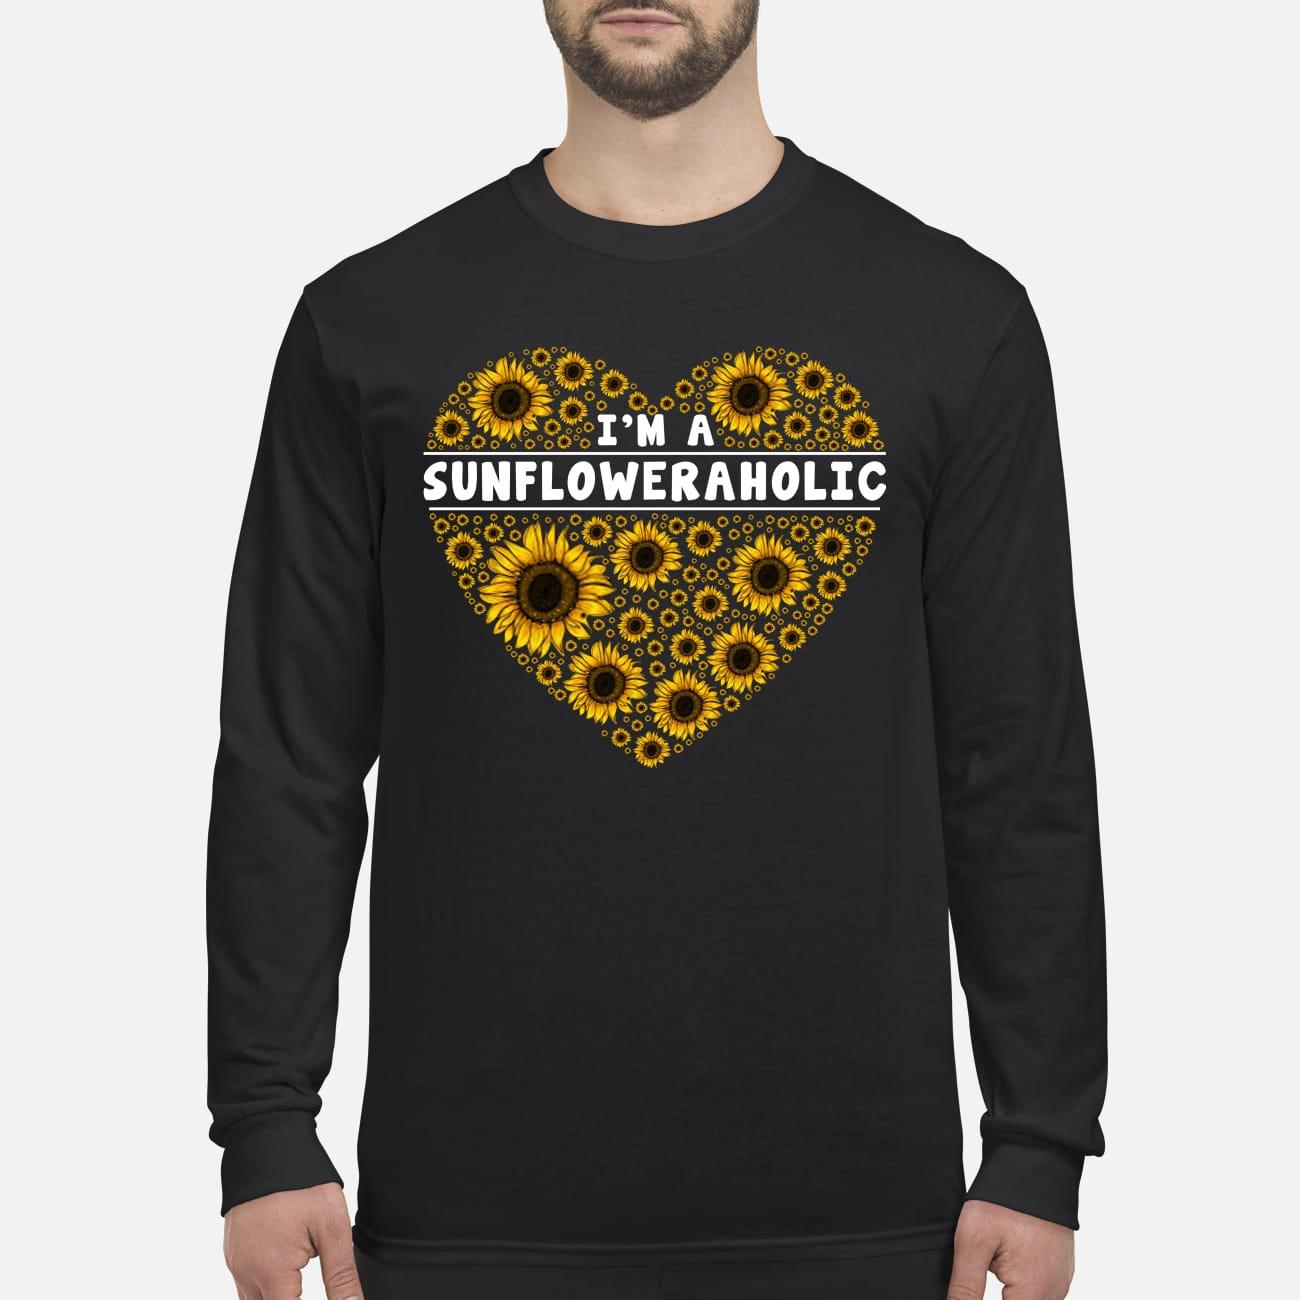 I'm a sunfloweraholic men's long sleeved shirt